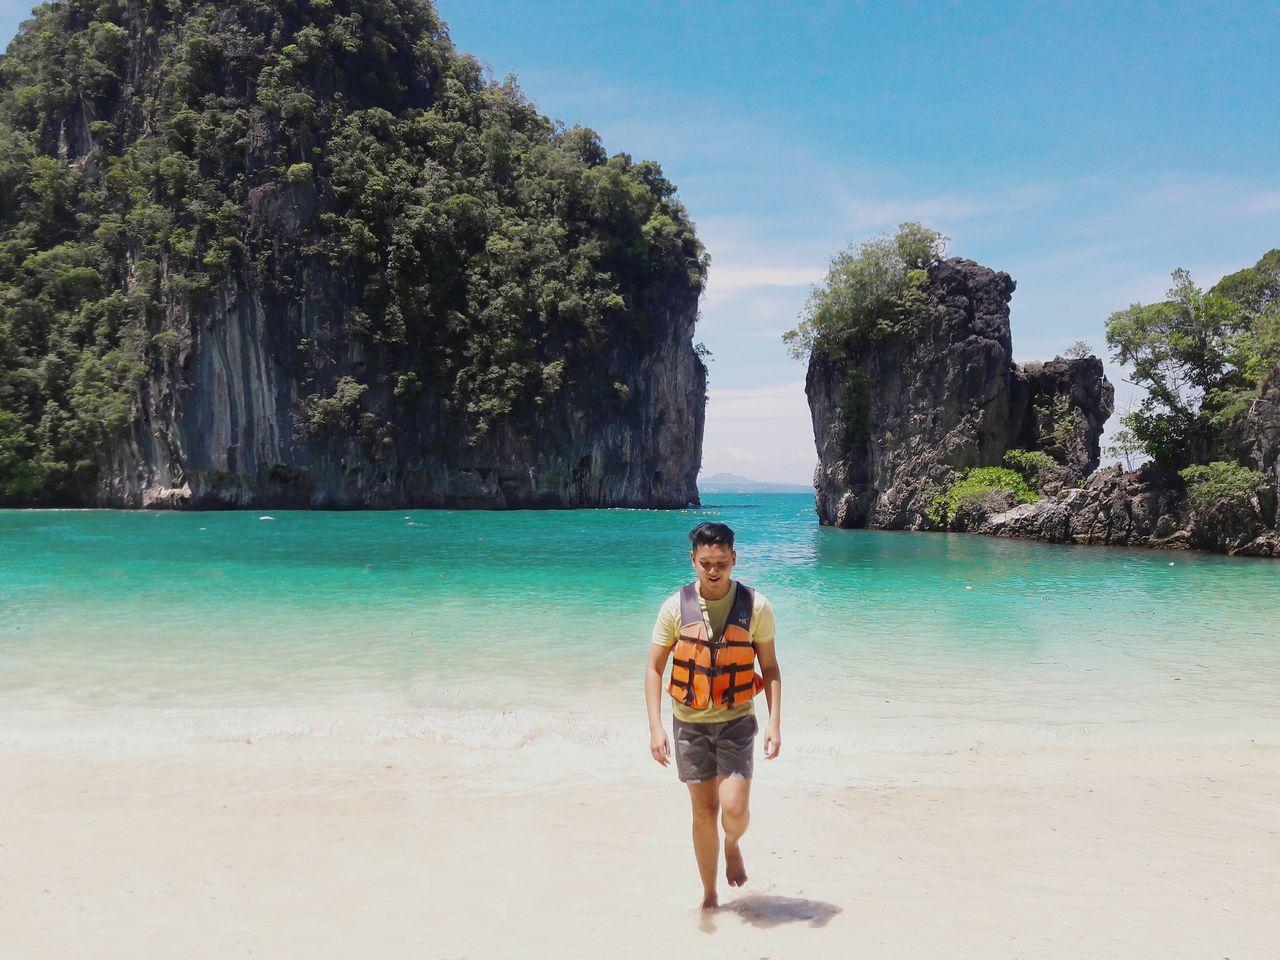 Beach Krabi Thailand Hongisland Island